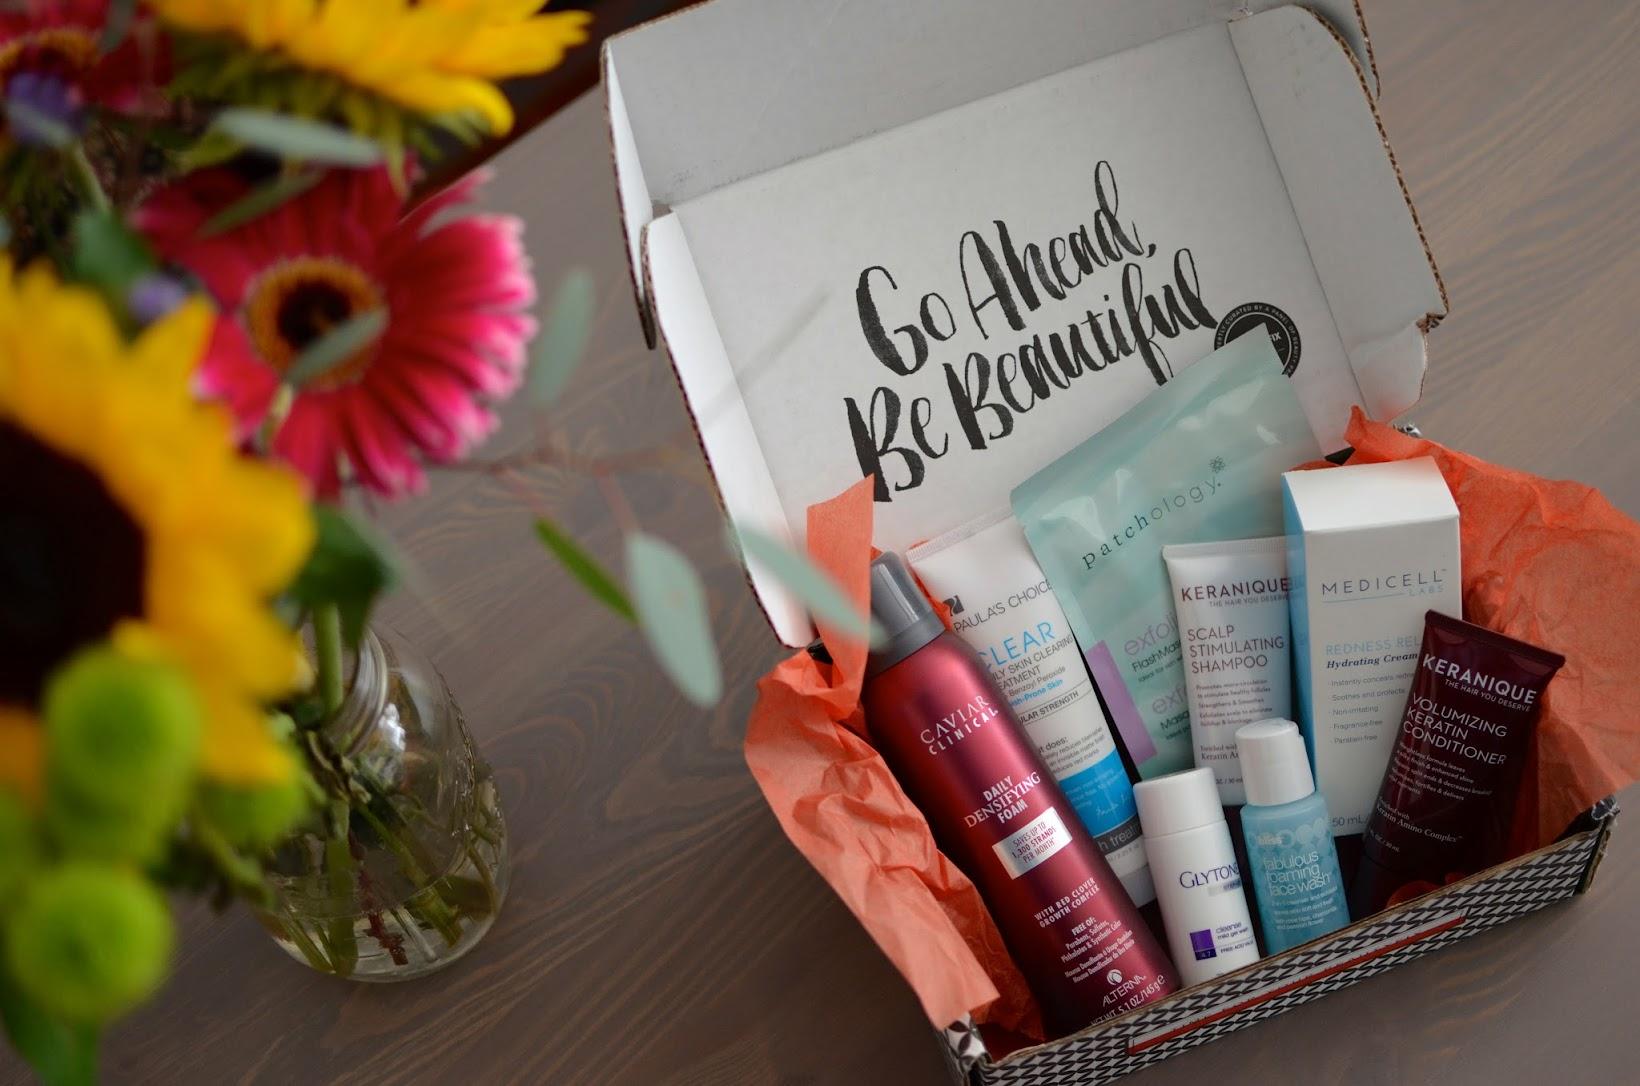 Dermstore, skincare, haircare, Dermstore BeautyFix box